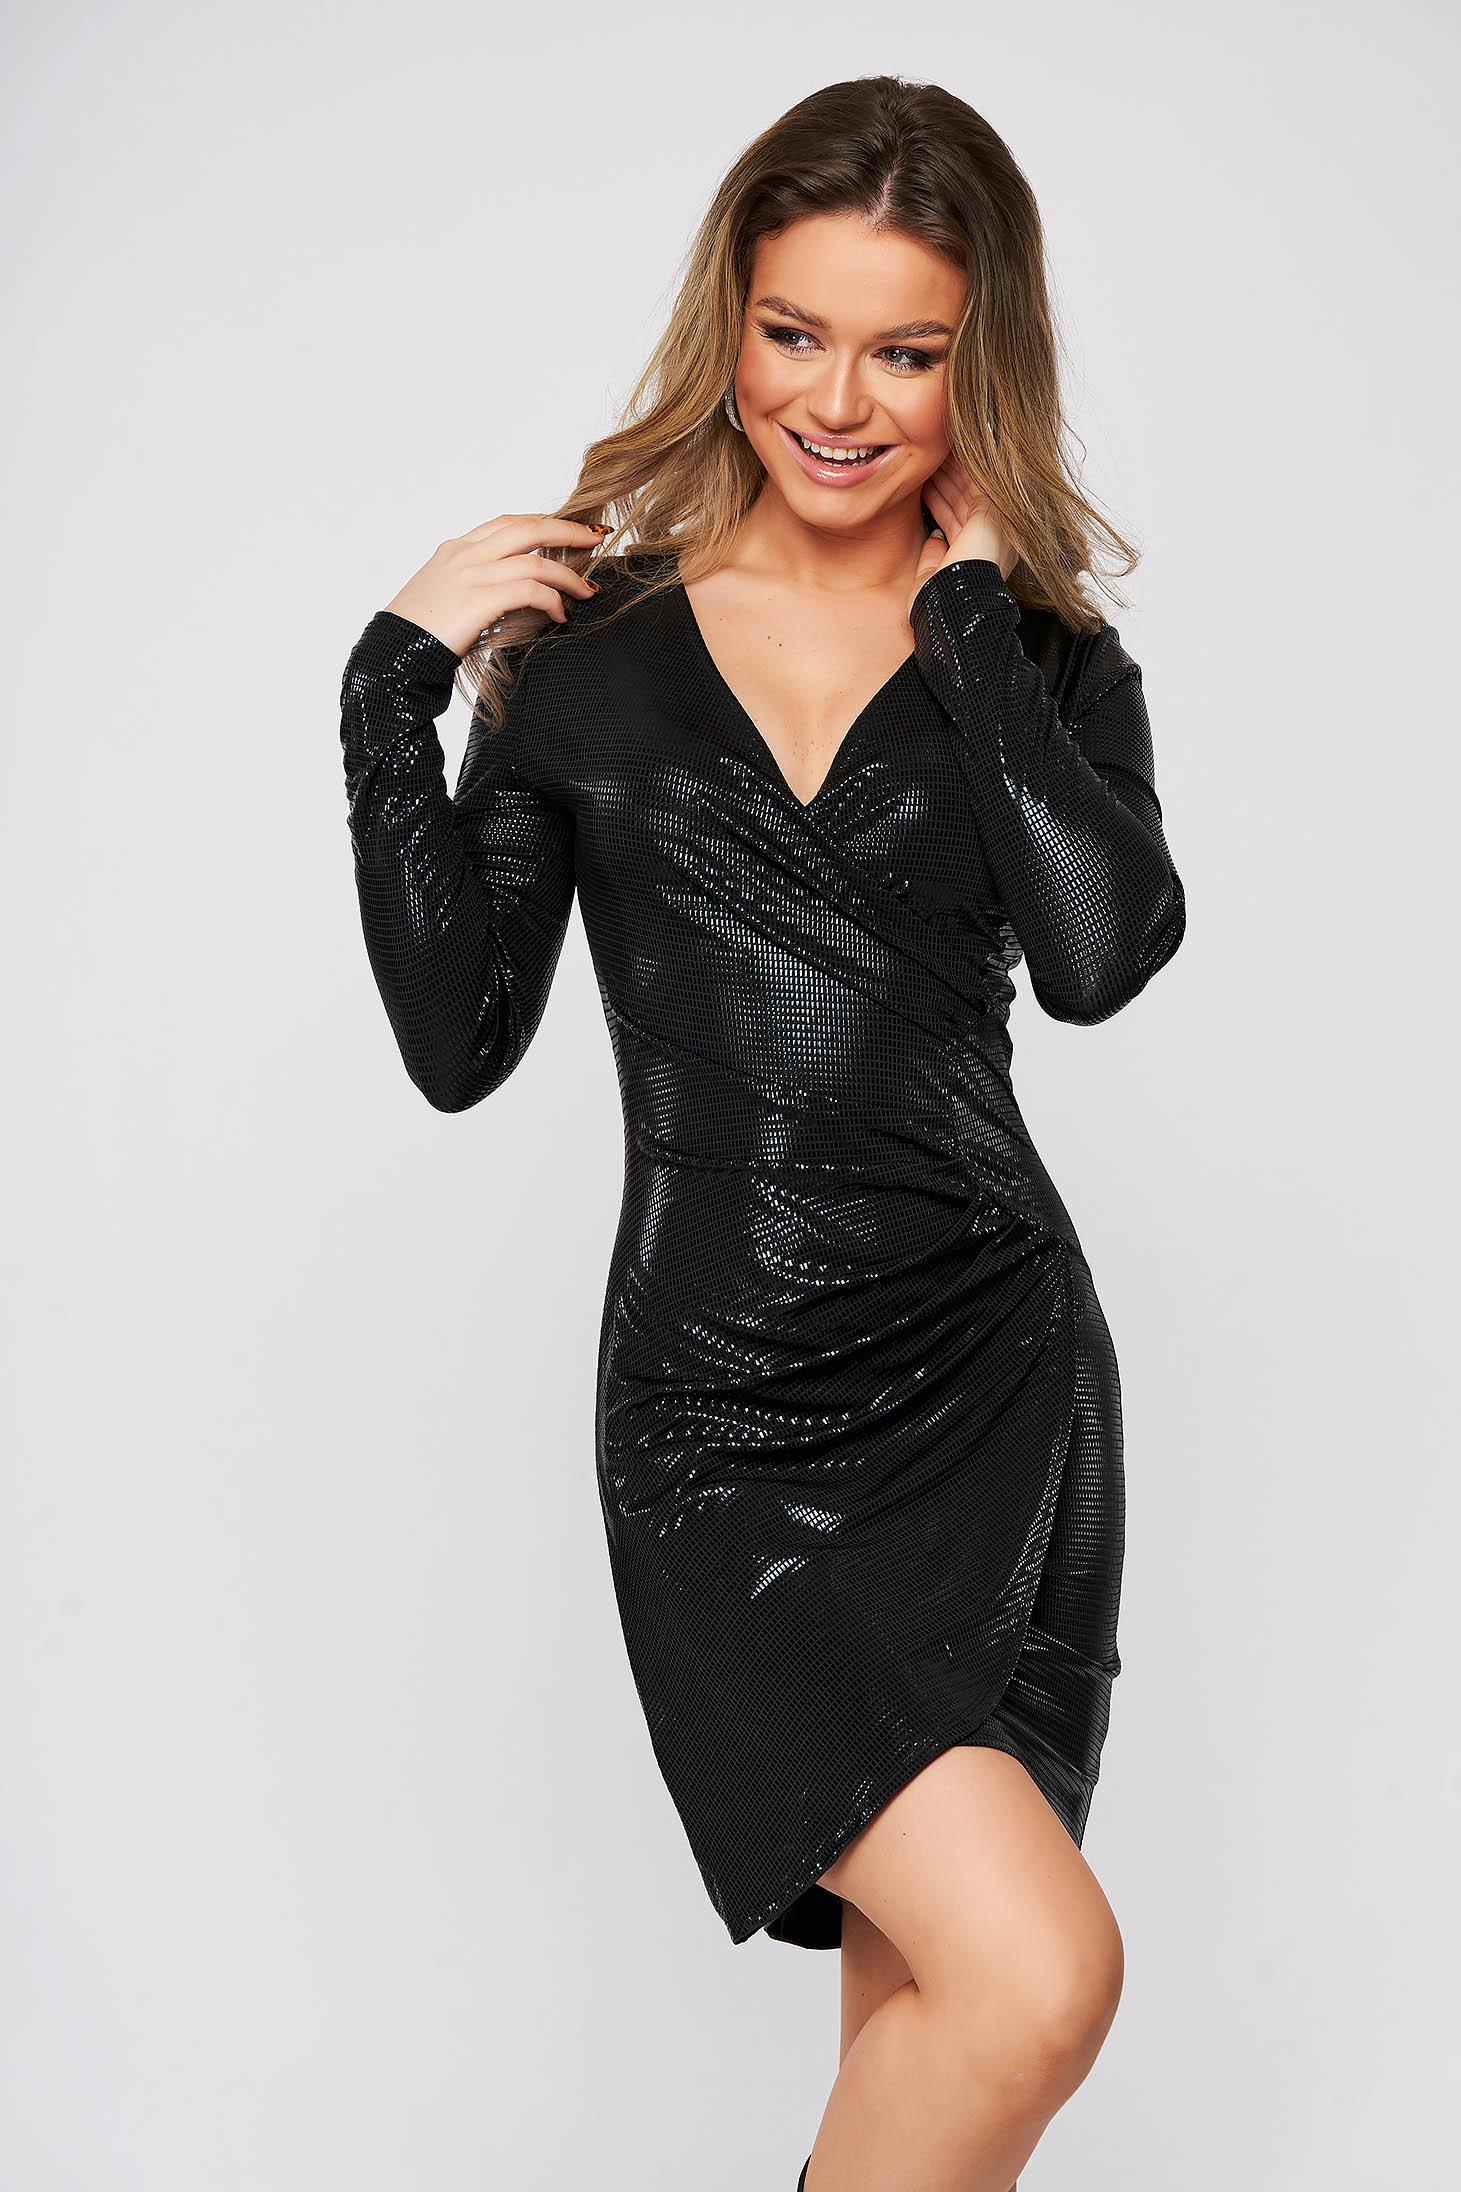 Rochie negru-metalizat de party din material elastic petrecuta tip creion scurta